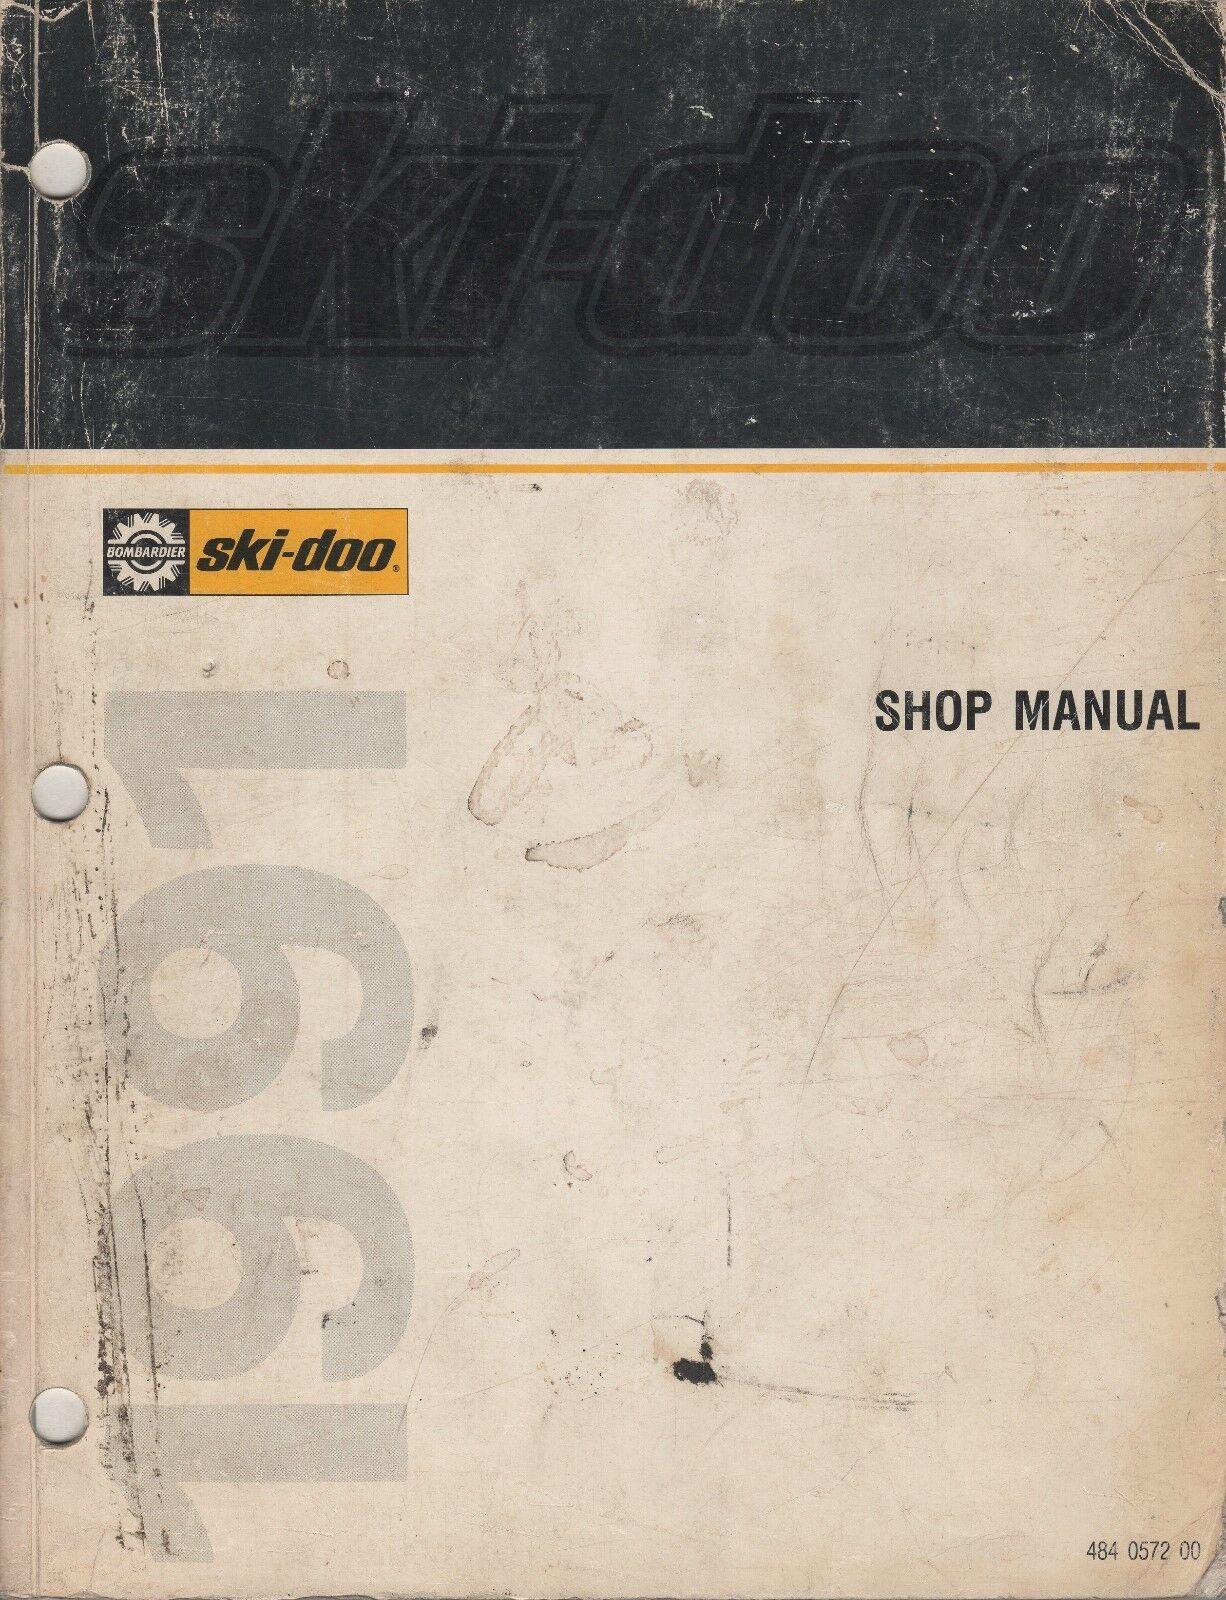 1991 SKI-DOO (see models in description) SHOP SERVICE MANUAL 484 0572 00 (424)